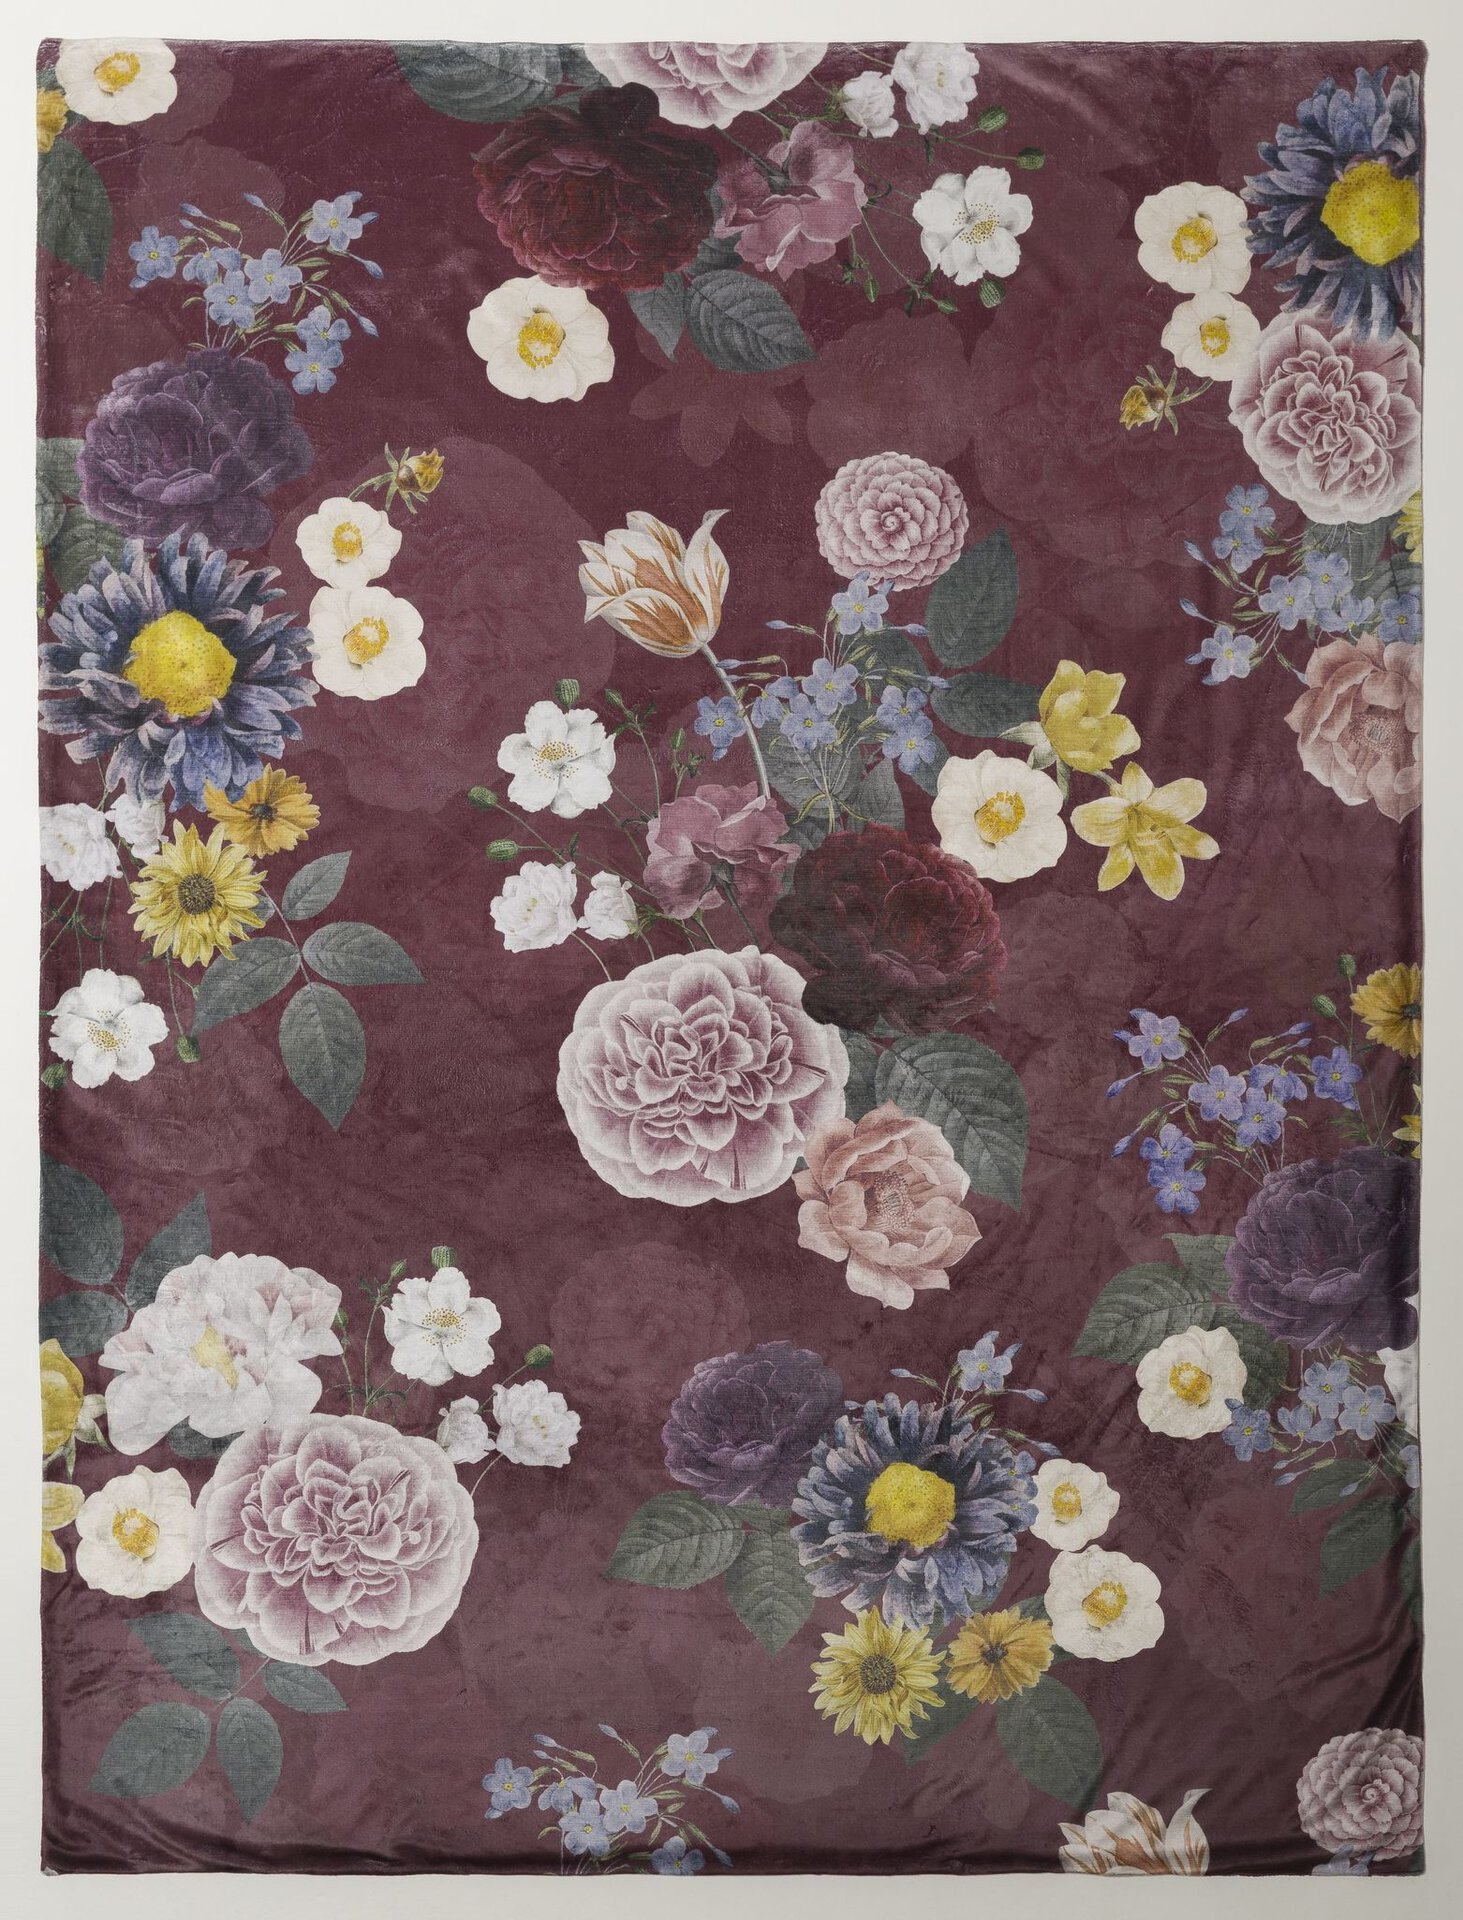 Wendedecke Digital-Blumen Casa Nova Textil rot 150 x 200 cm